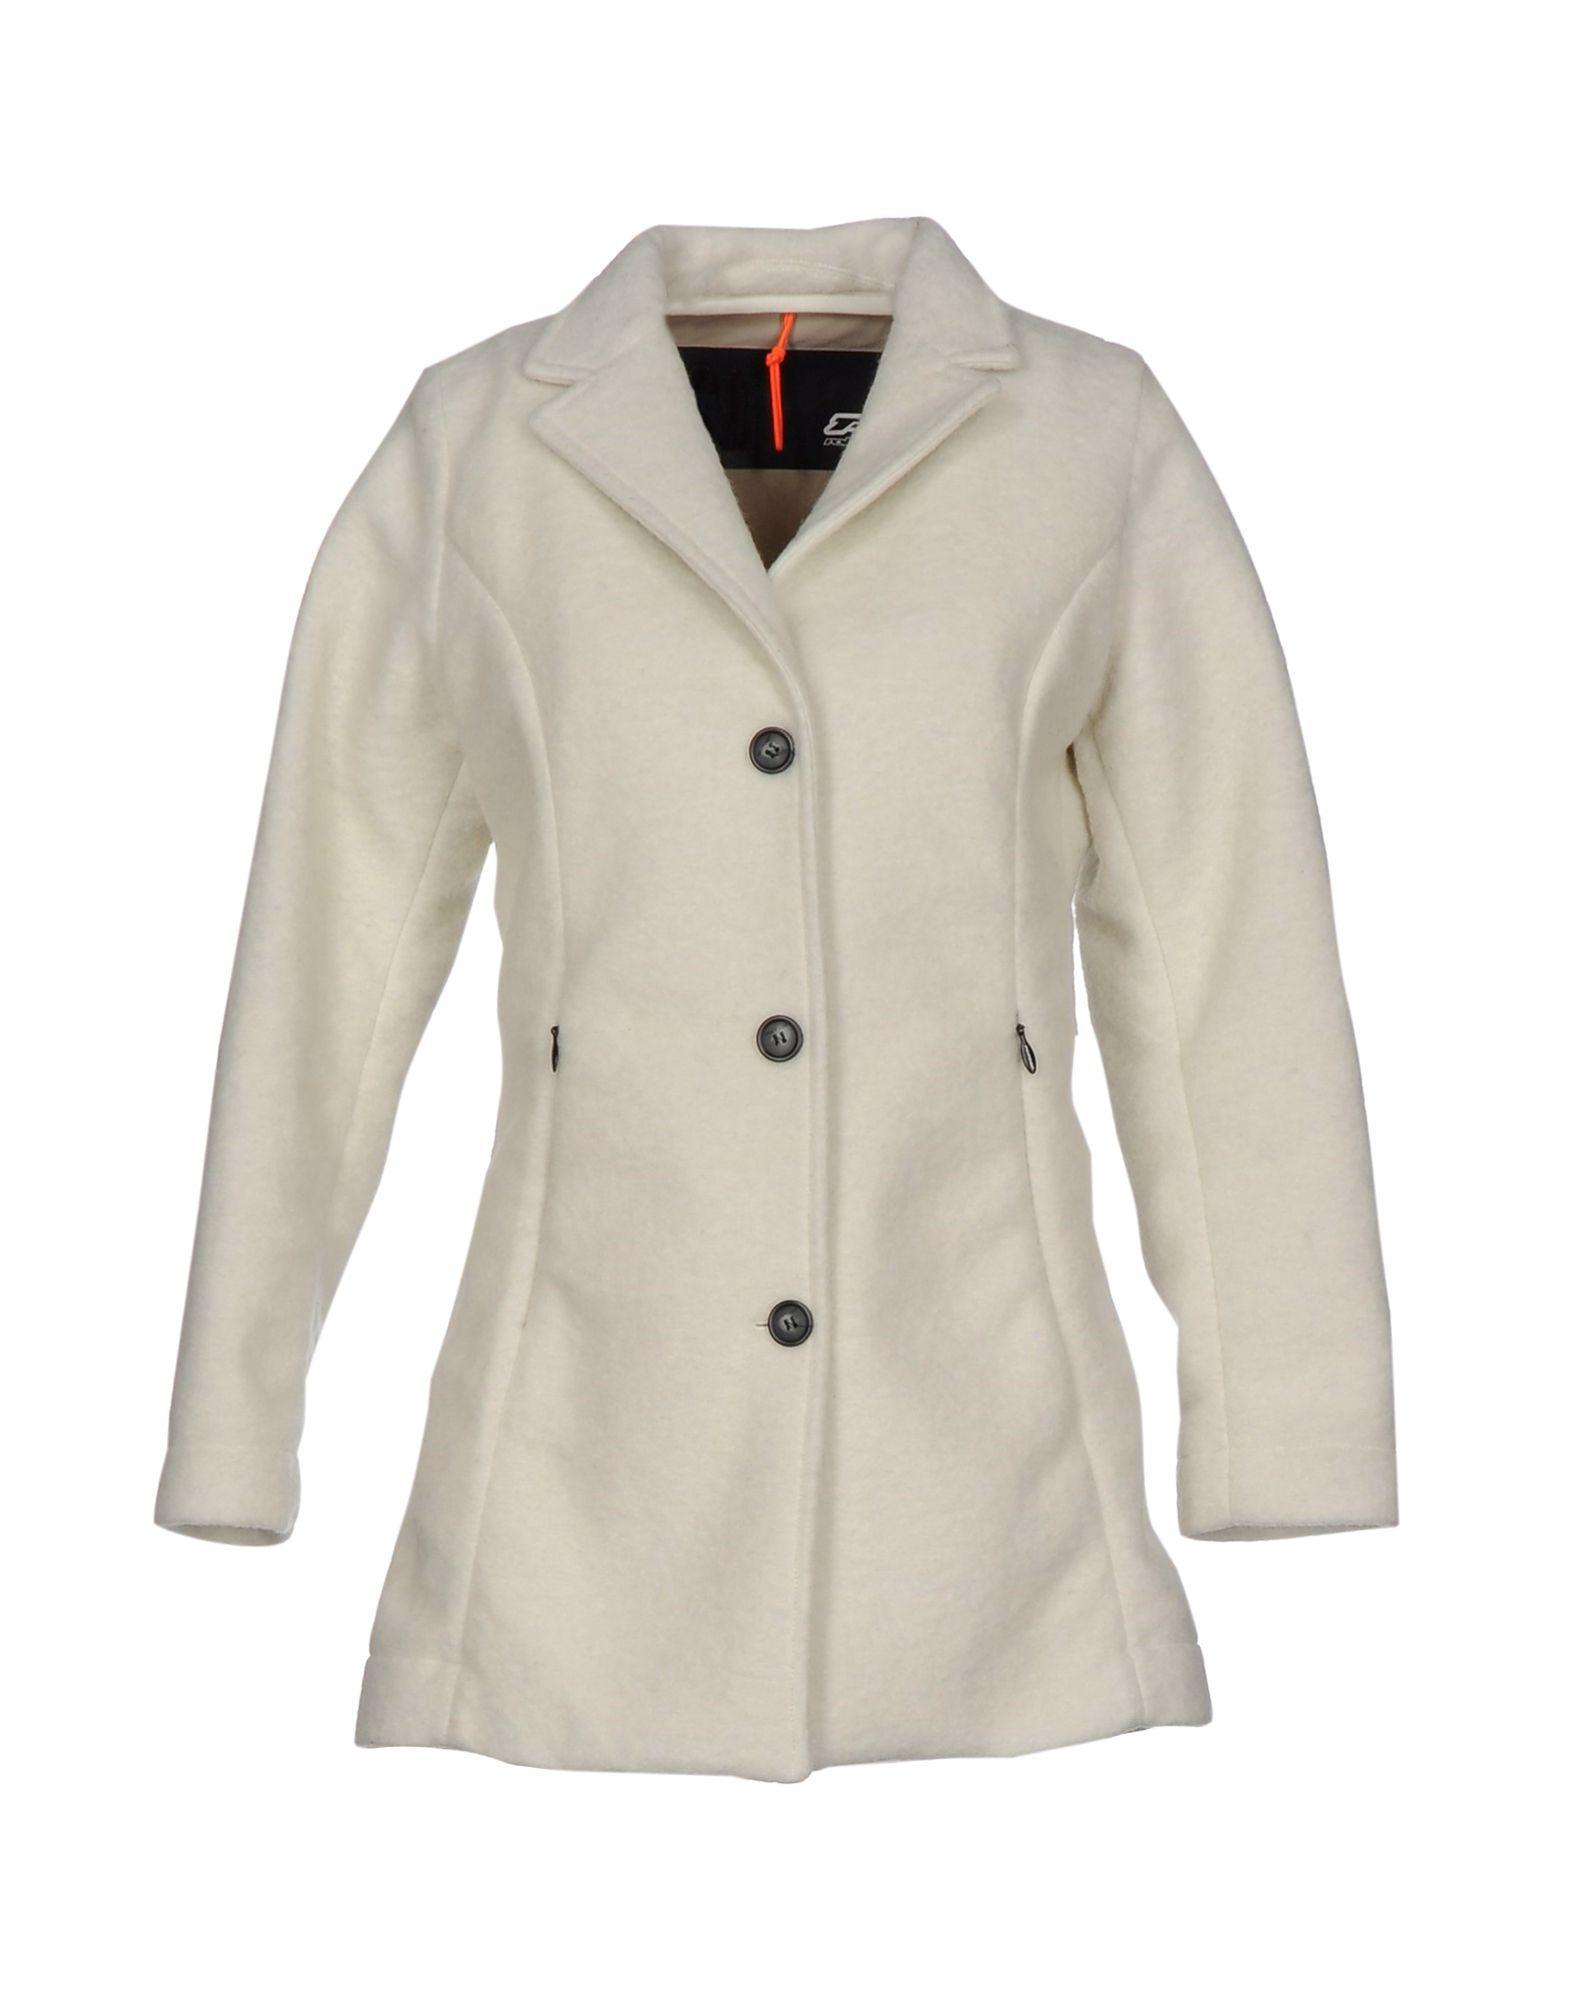 Rrd Coats In Ivory